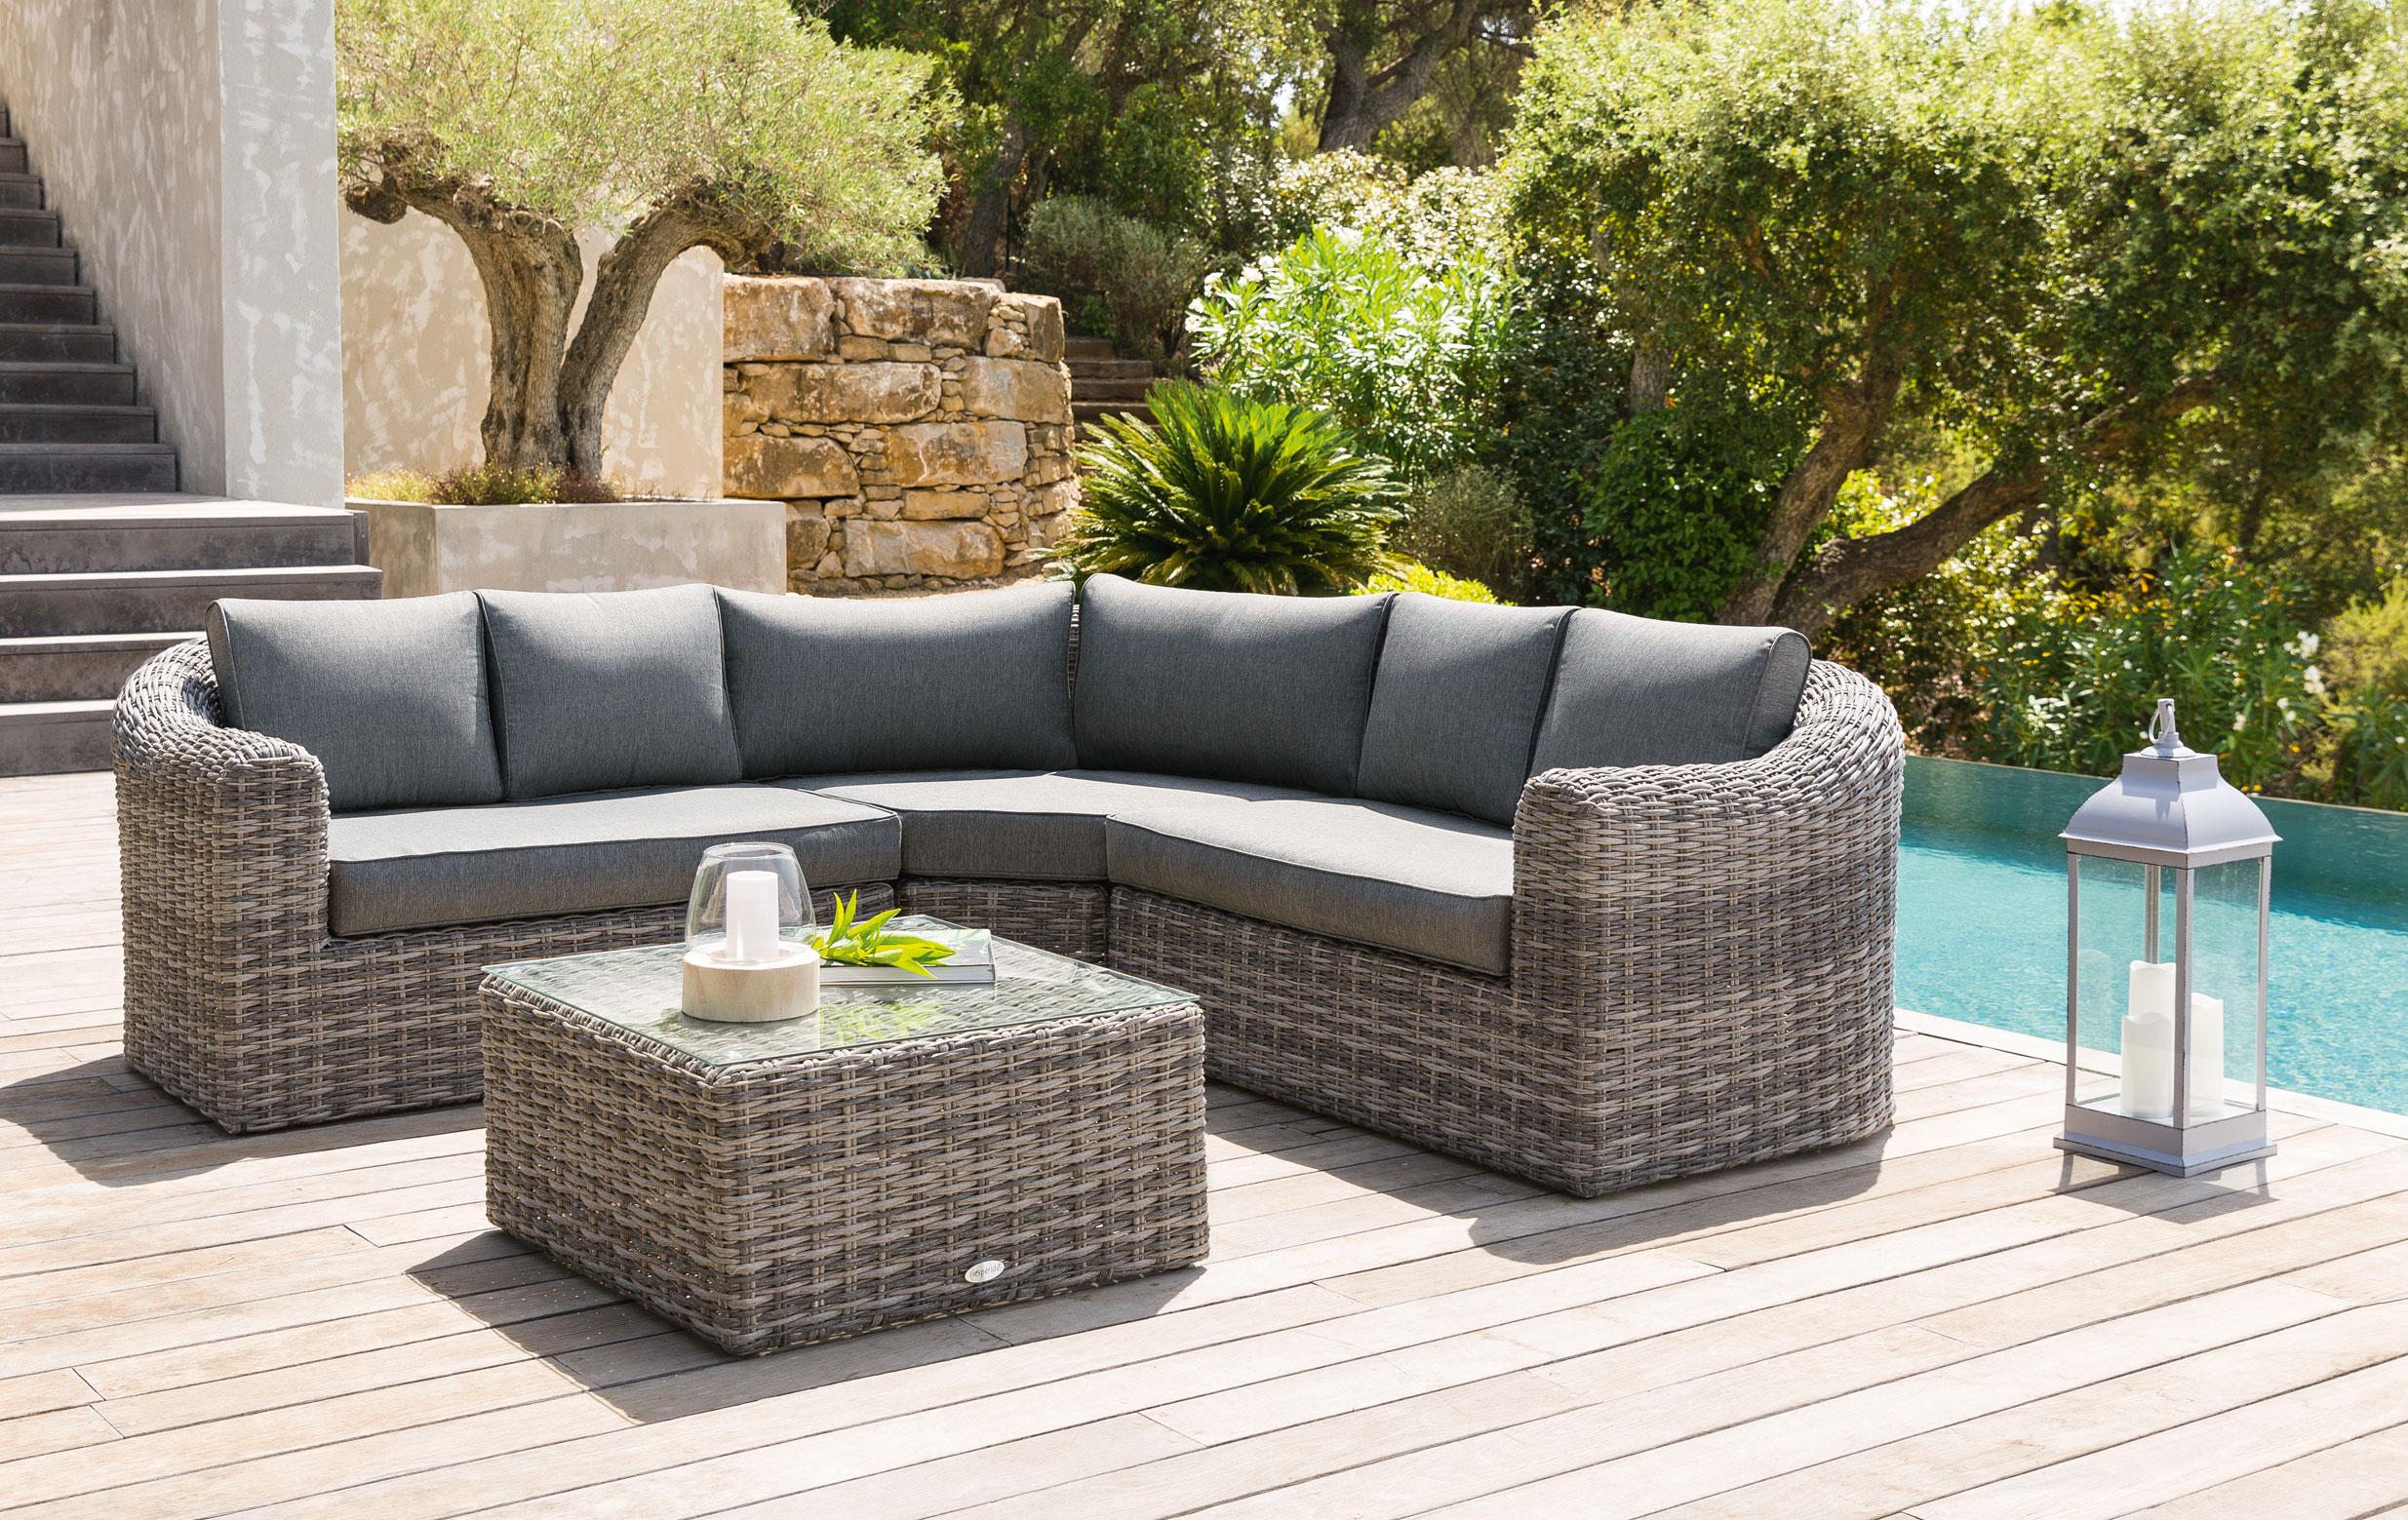 Jja | Hespéride: Garden Furniture dedans Hesperides Mobilier Jardin